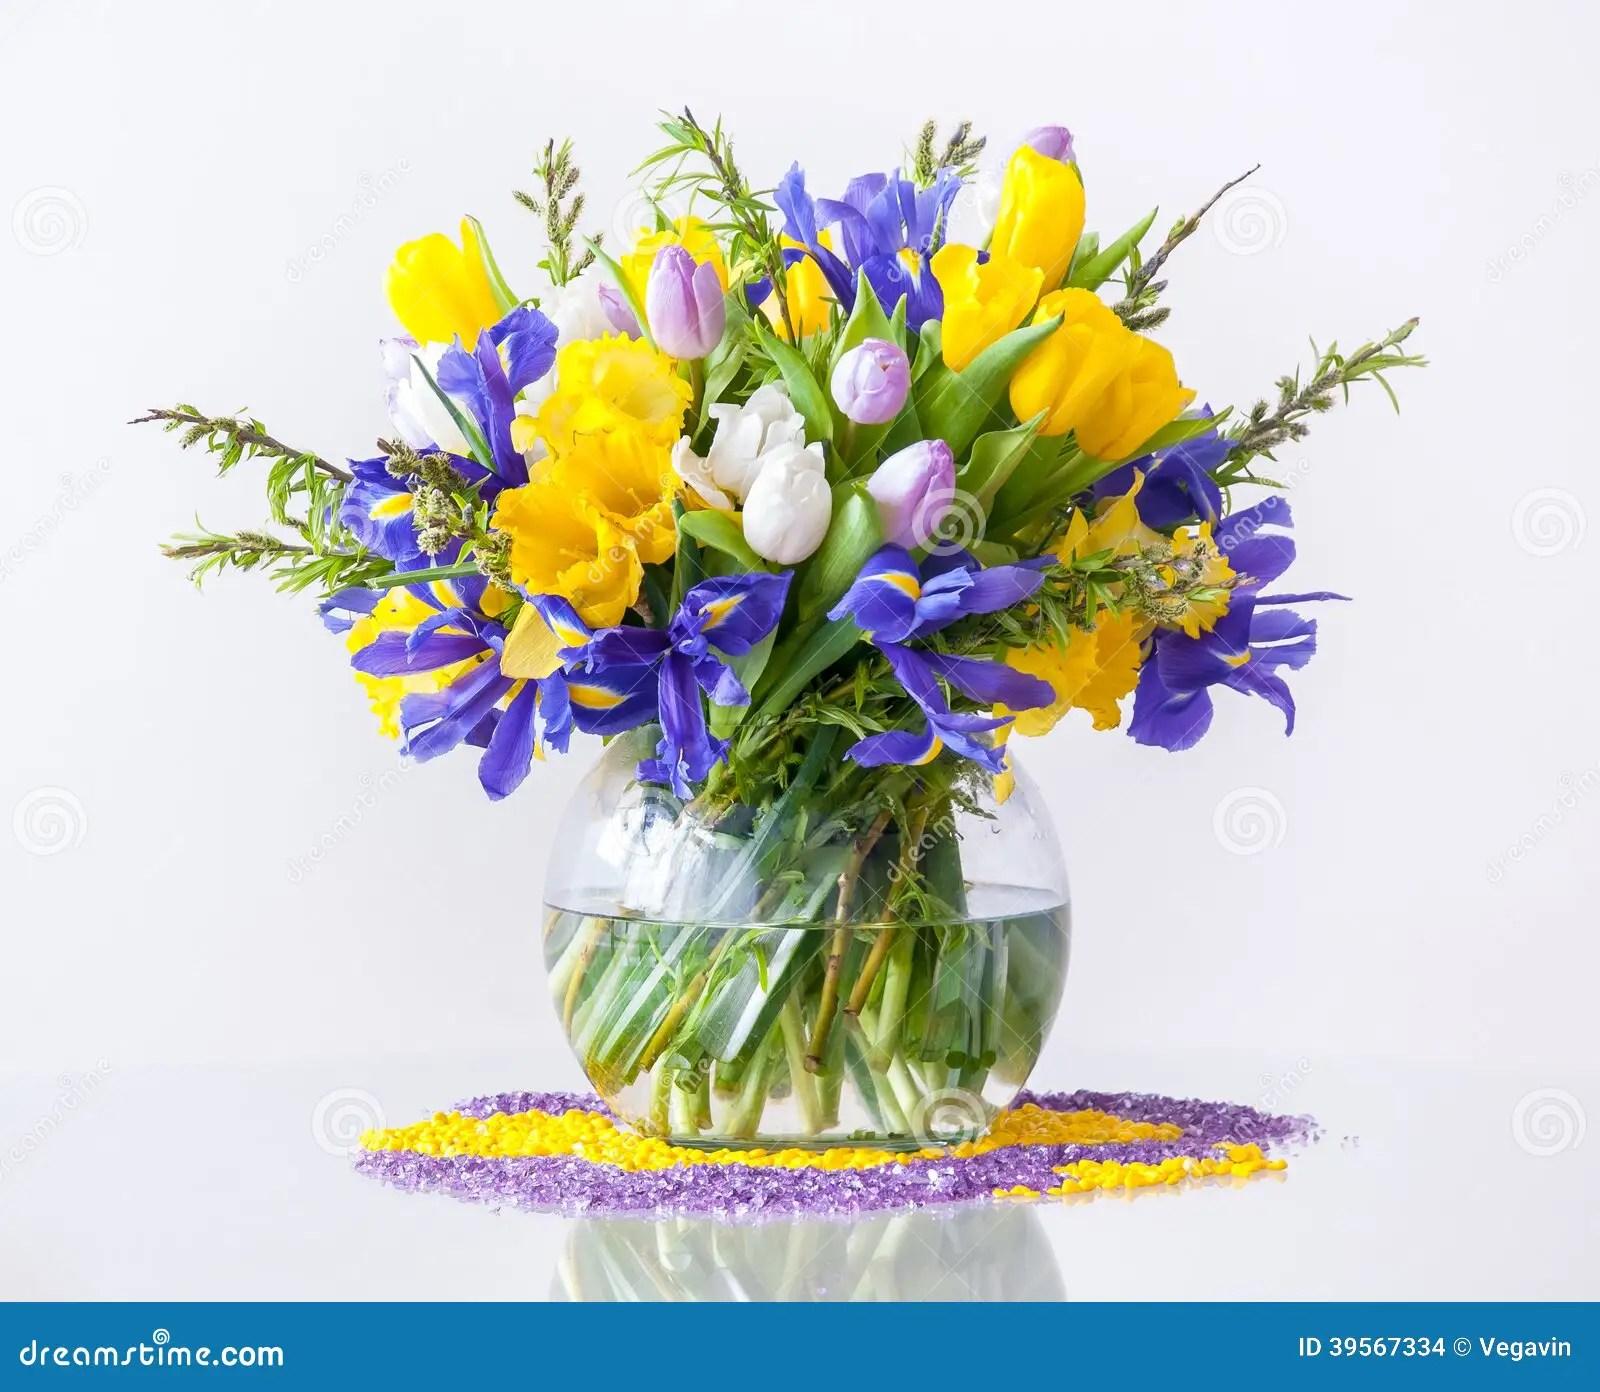 Blumenstrau Von FrhlingsBlumen Stockfoto  Bild 39567334